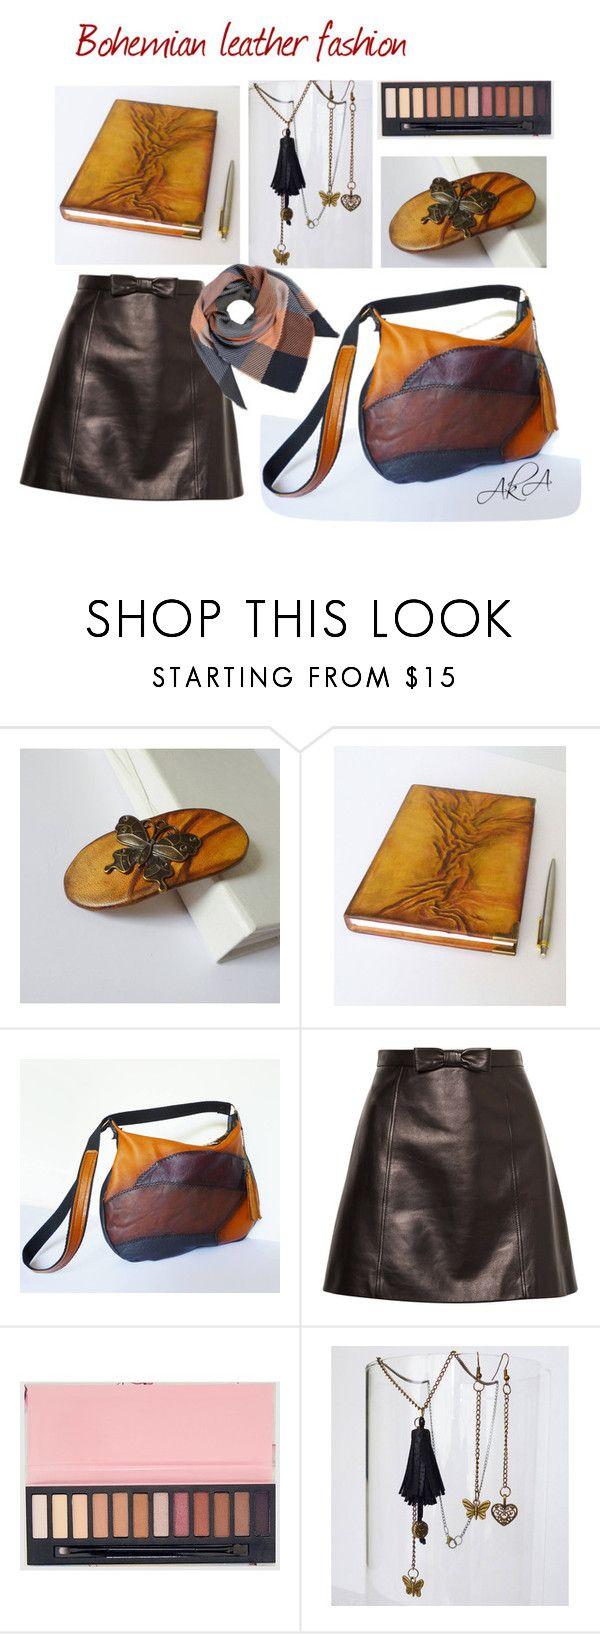 """Bohemian leather fashion"" by annakis on Polyvore featuring Miu Miu"